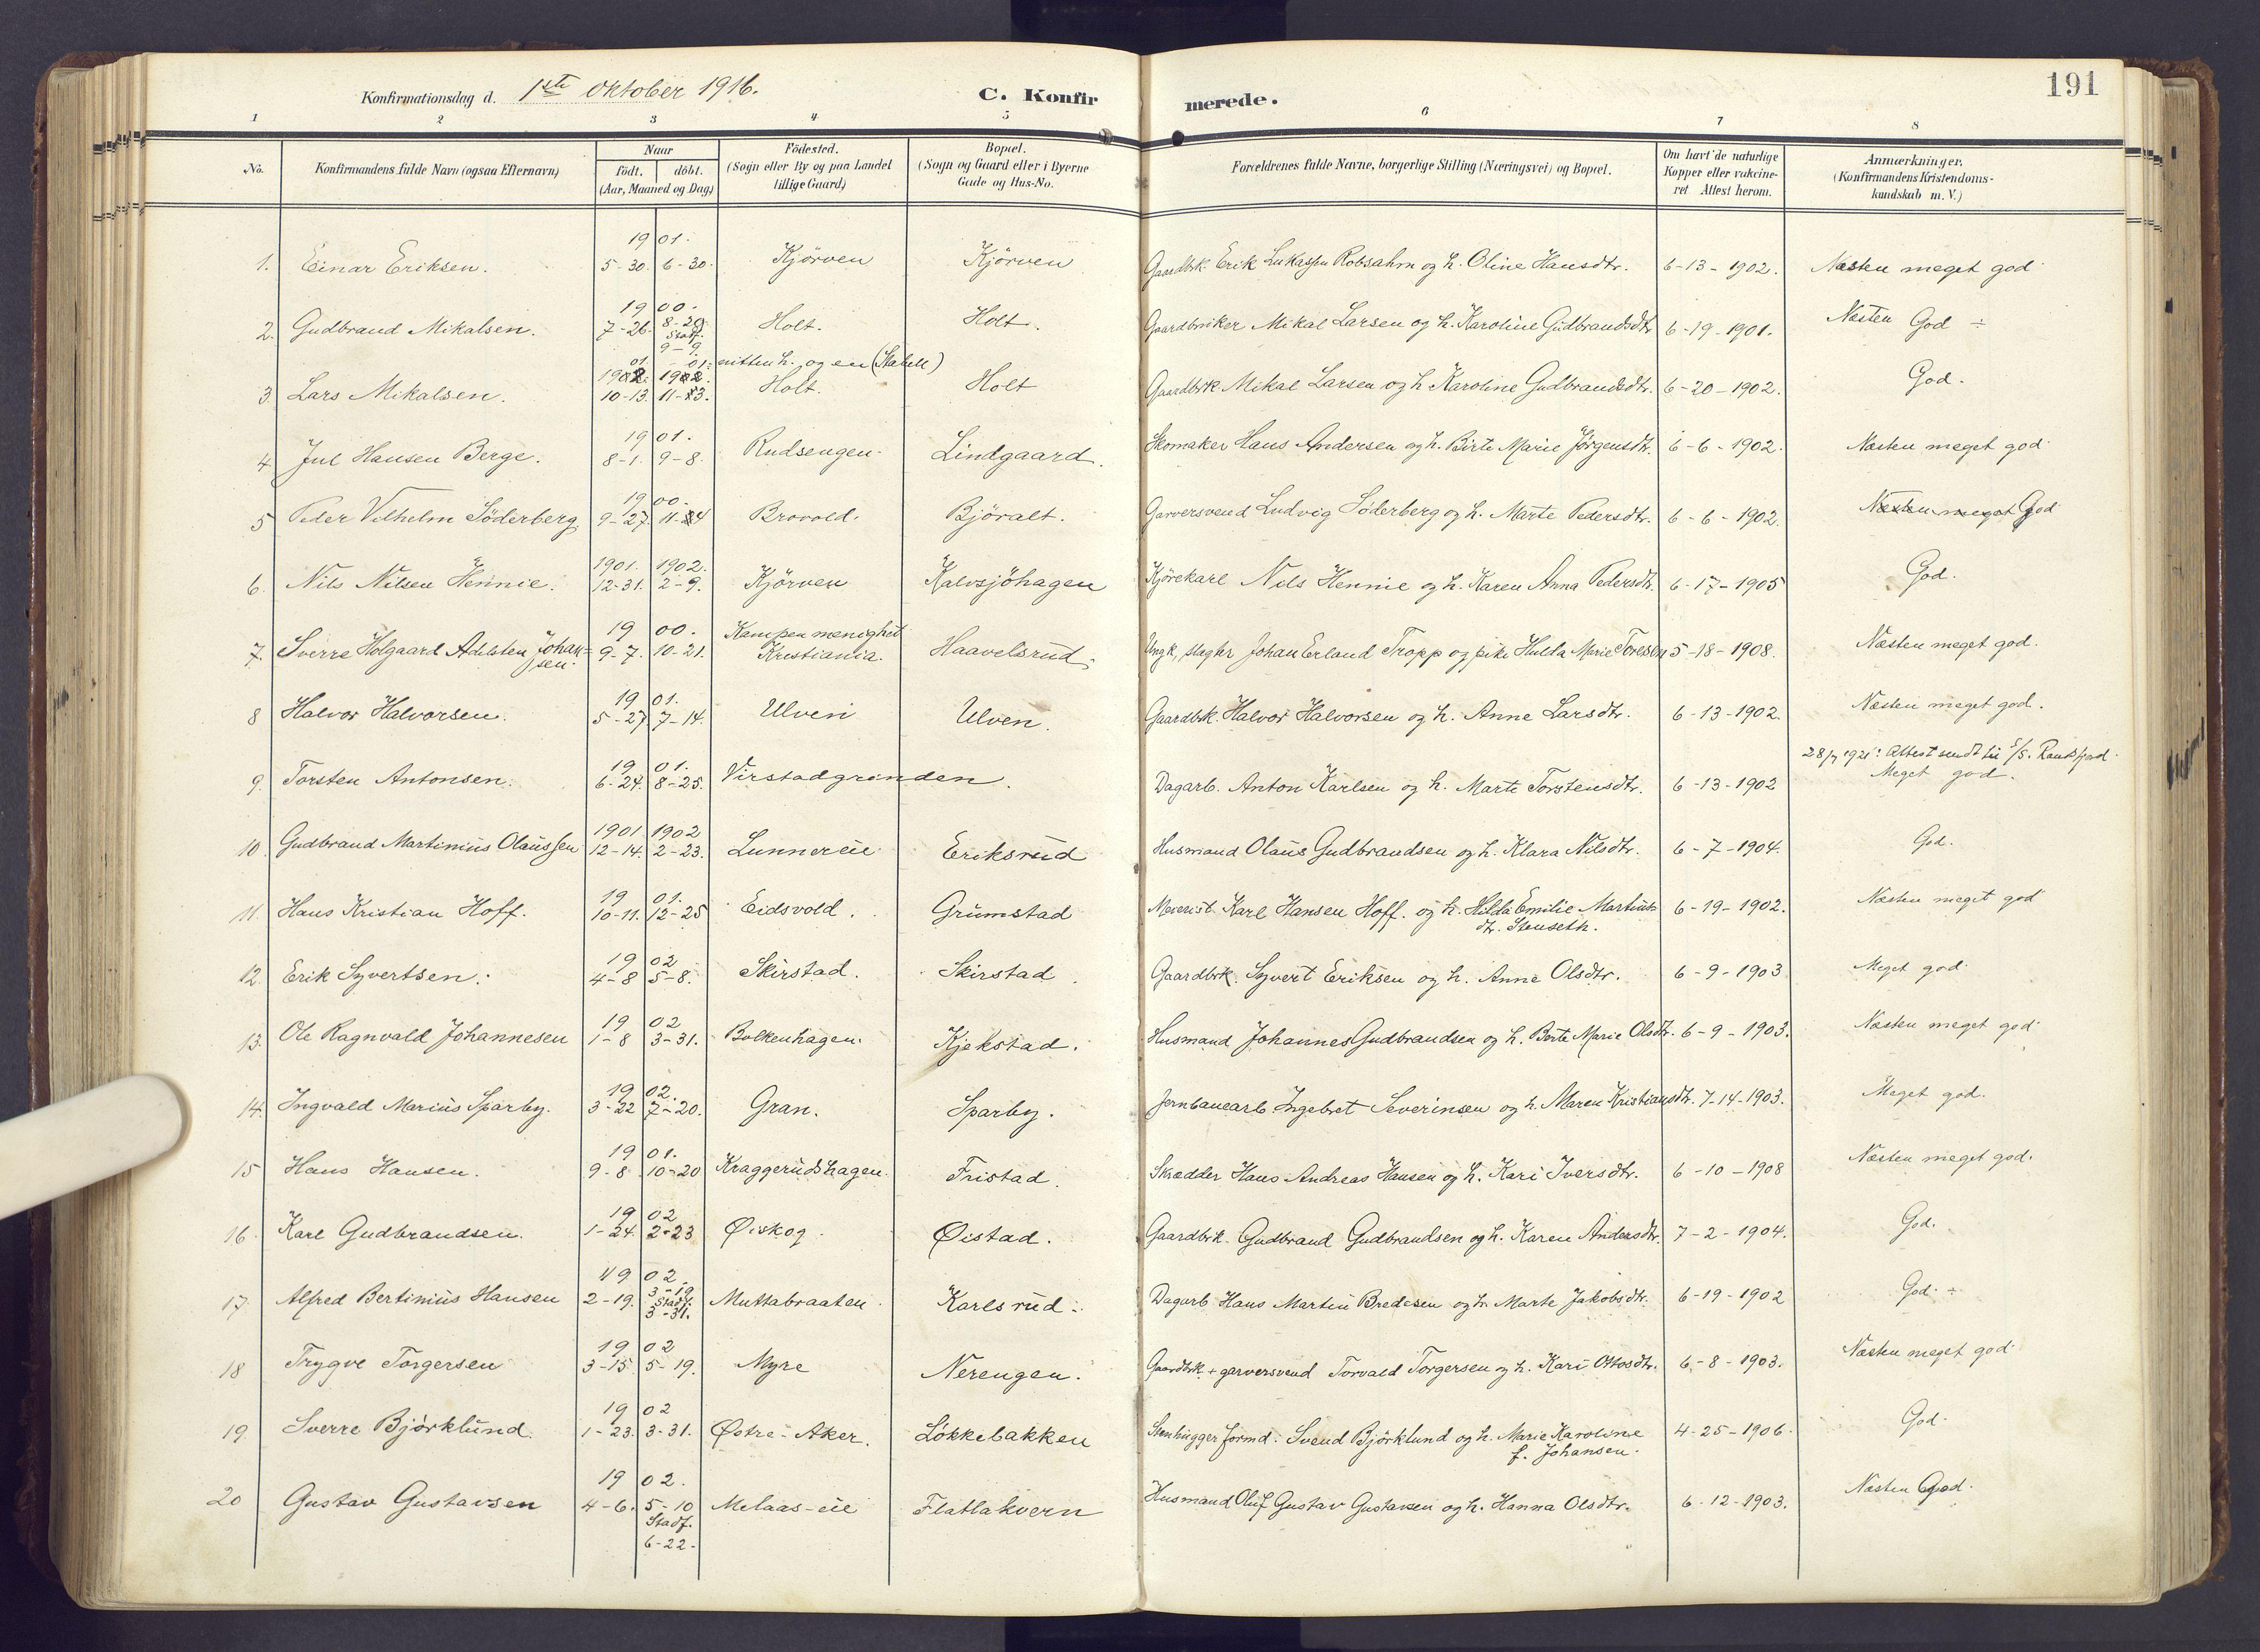 SAH, Lunner prestekontor, H/Ha/Haa/L0001: Ministerialbok nr. 1, 1907-1922, s. 191